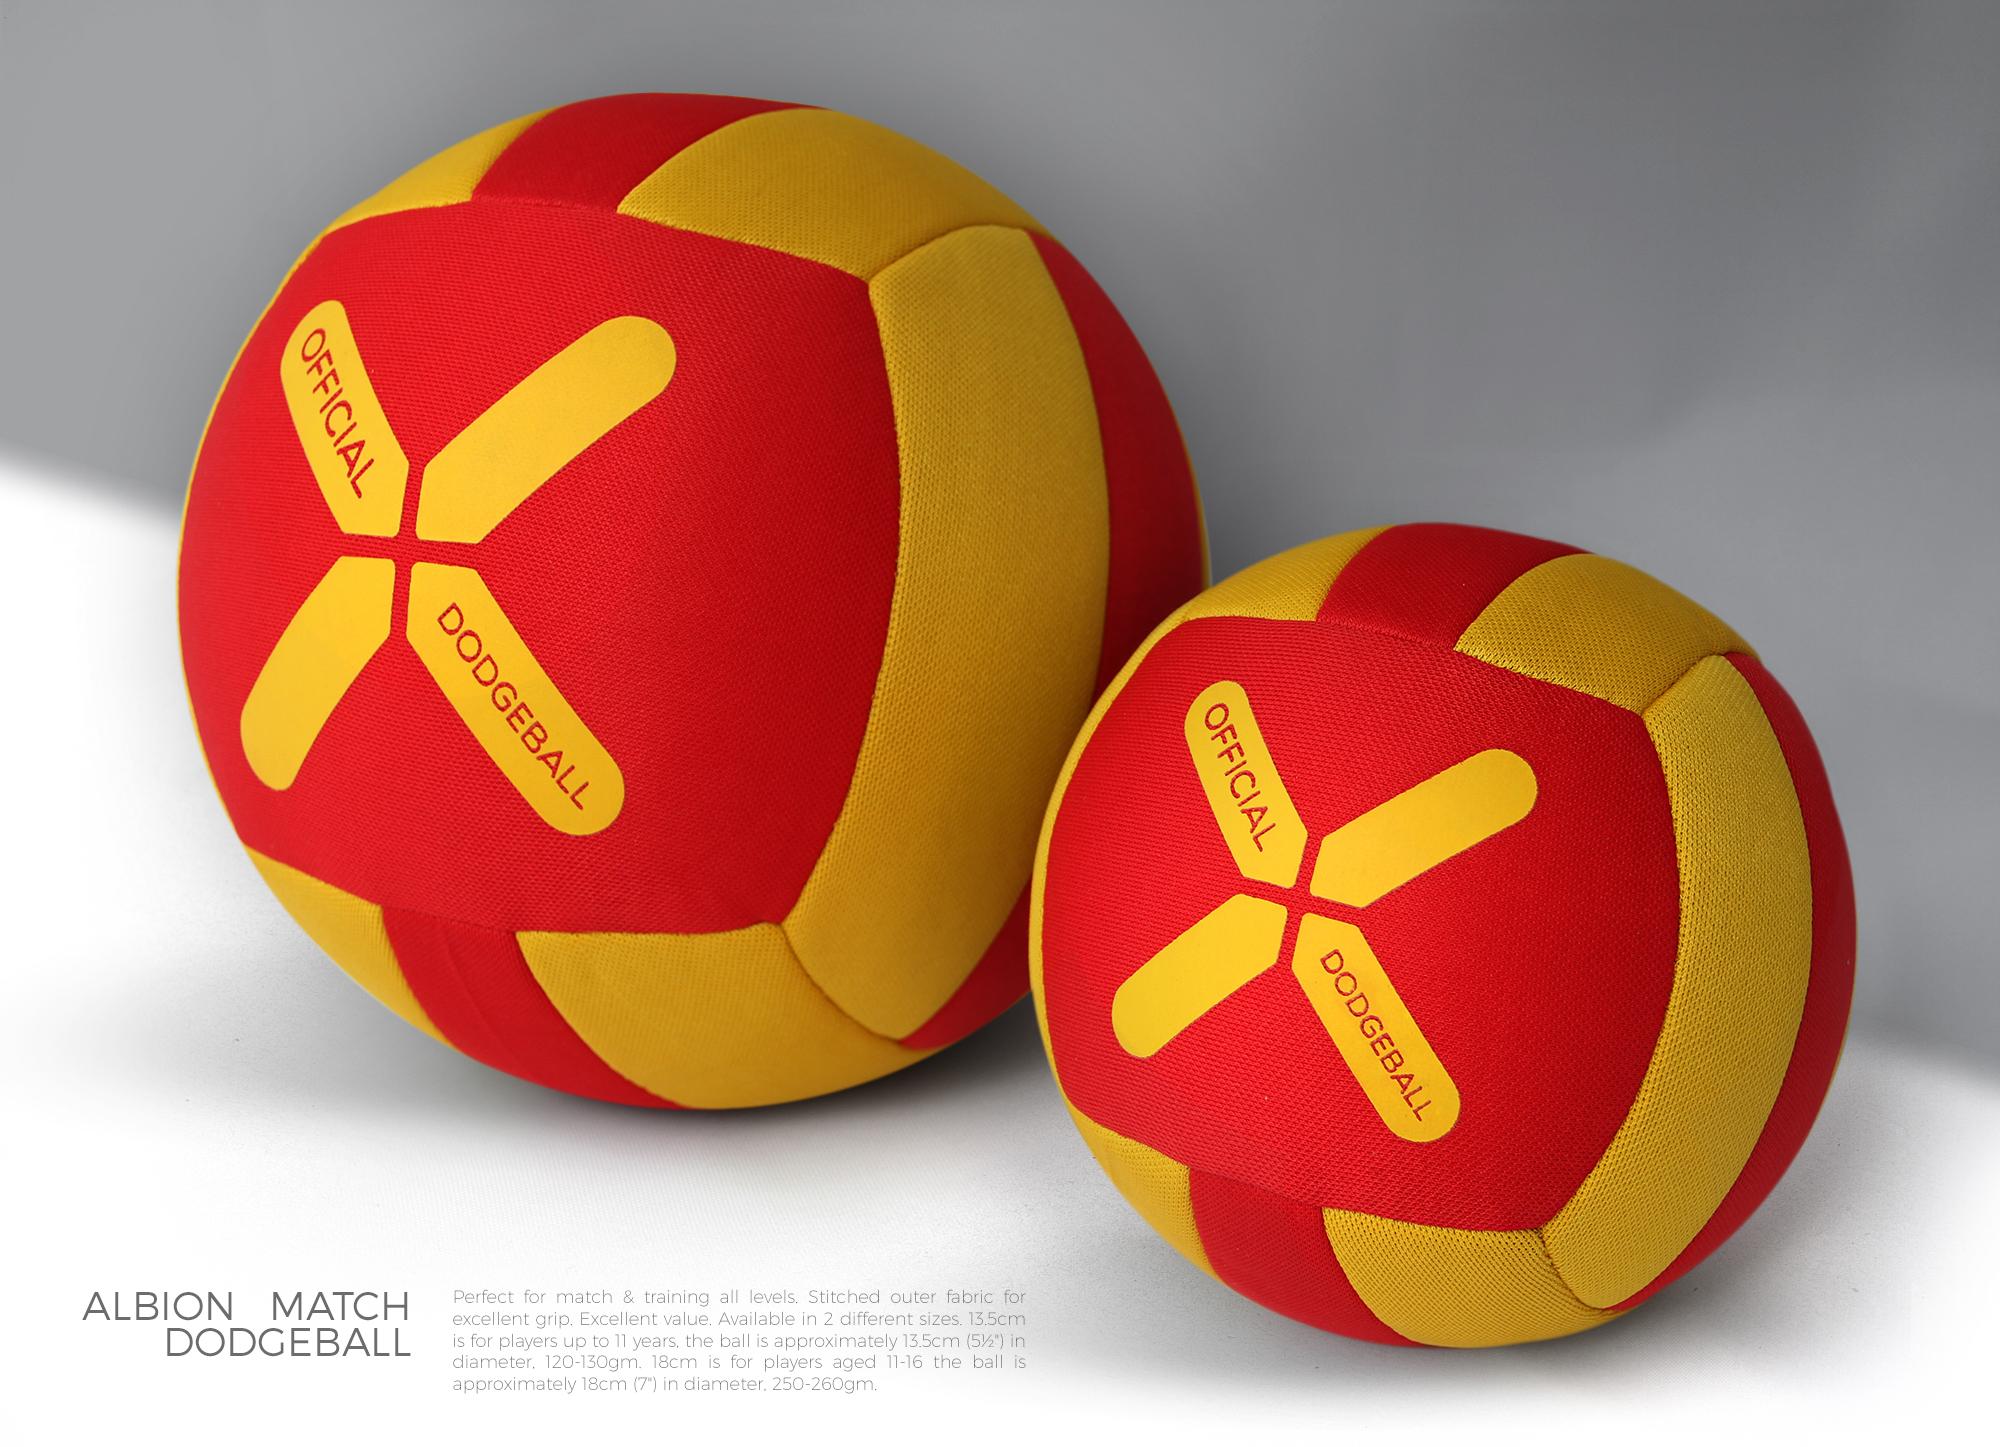 Albion Match Dodgeball / Rebranding / Logobou